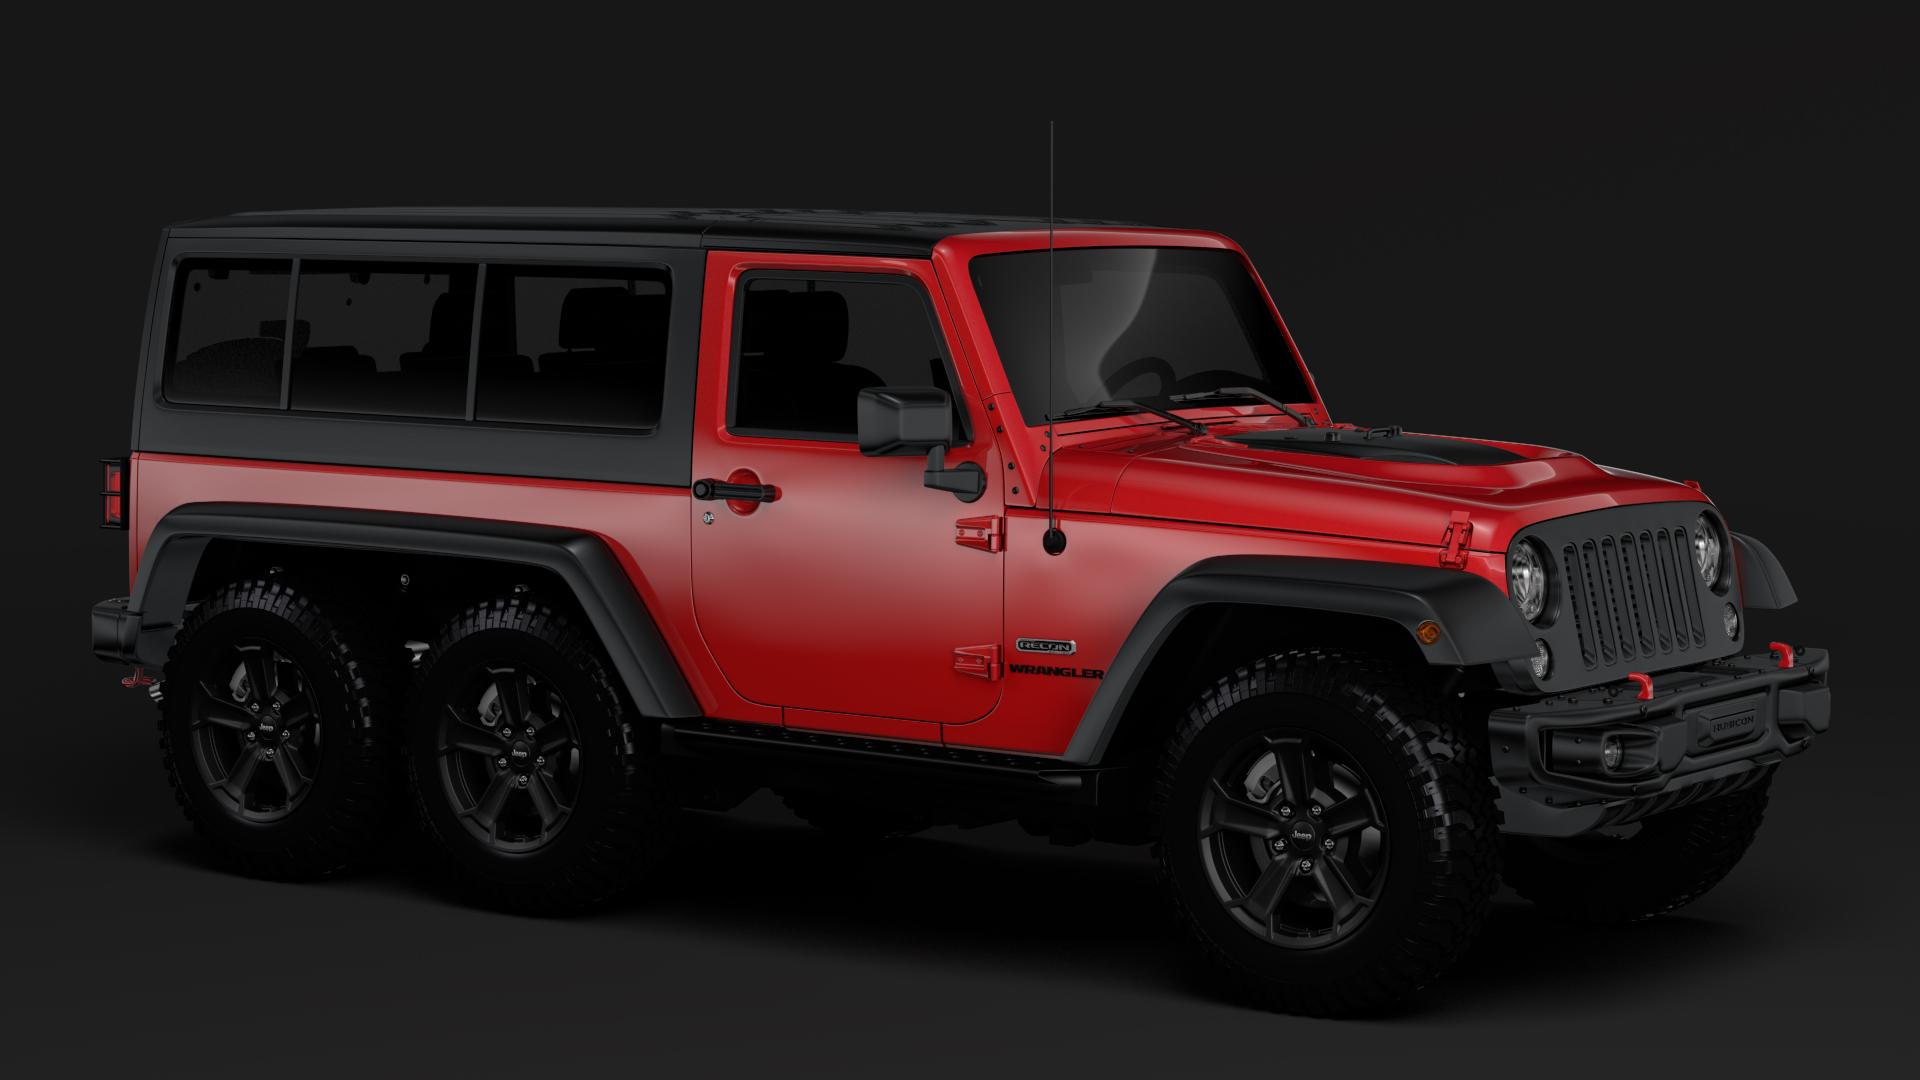 jeep wrangler 6×6 rubicon recon jk 2017 3d model max fbx c4d lwo ma mb hrc xsi obj 276843